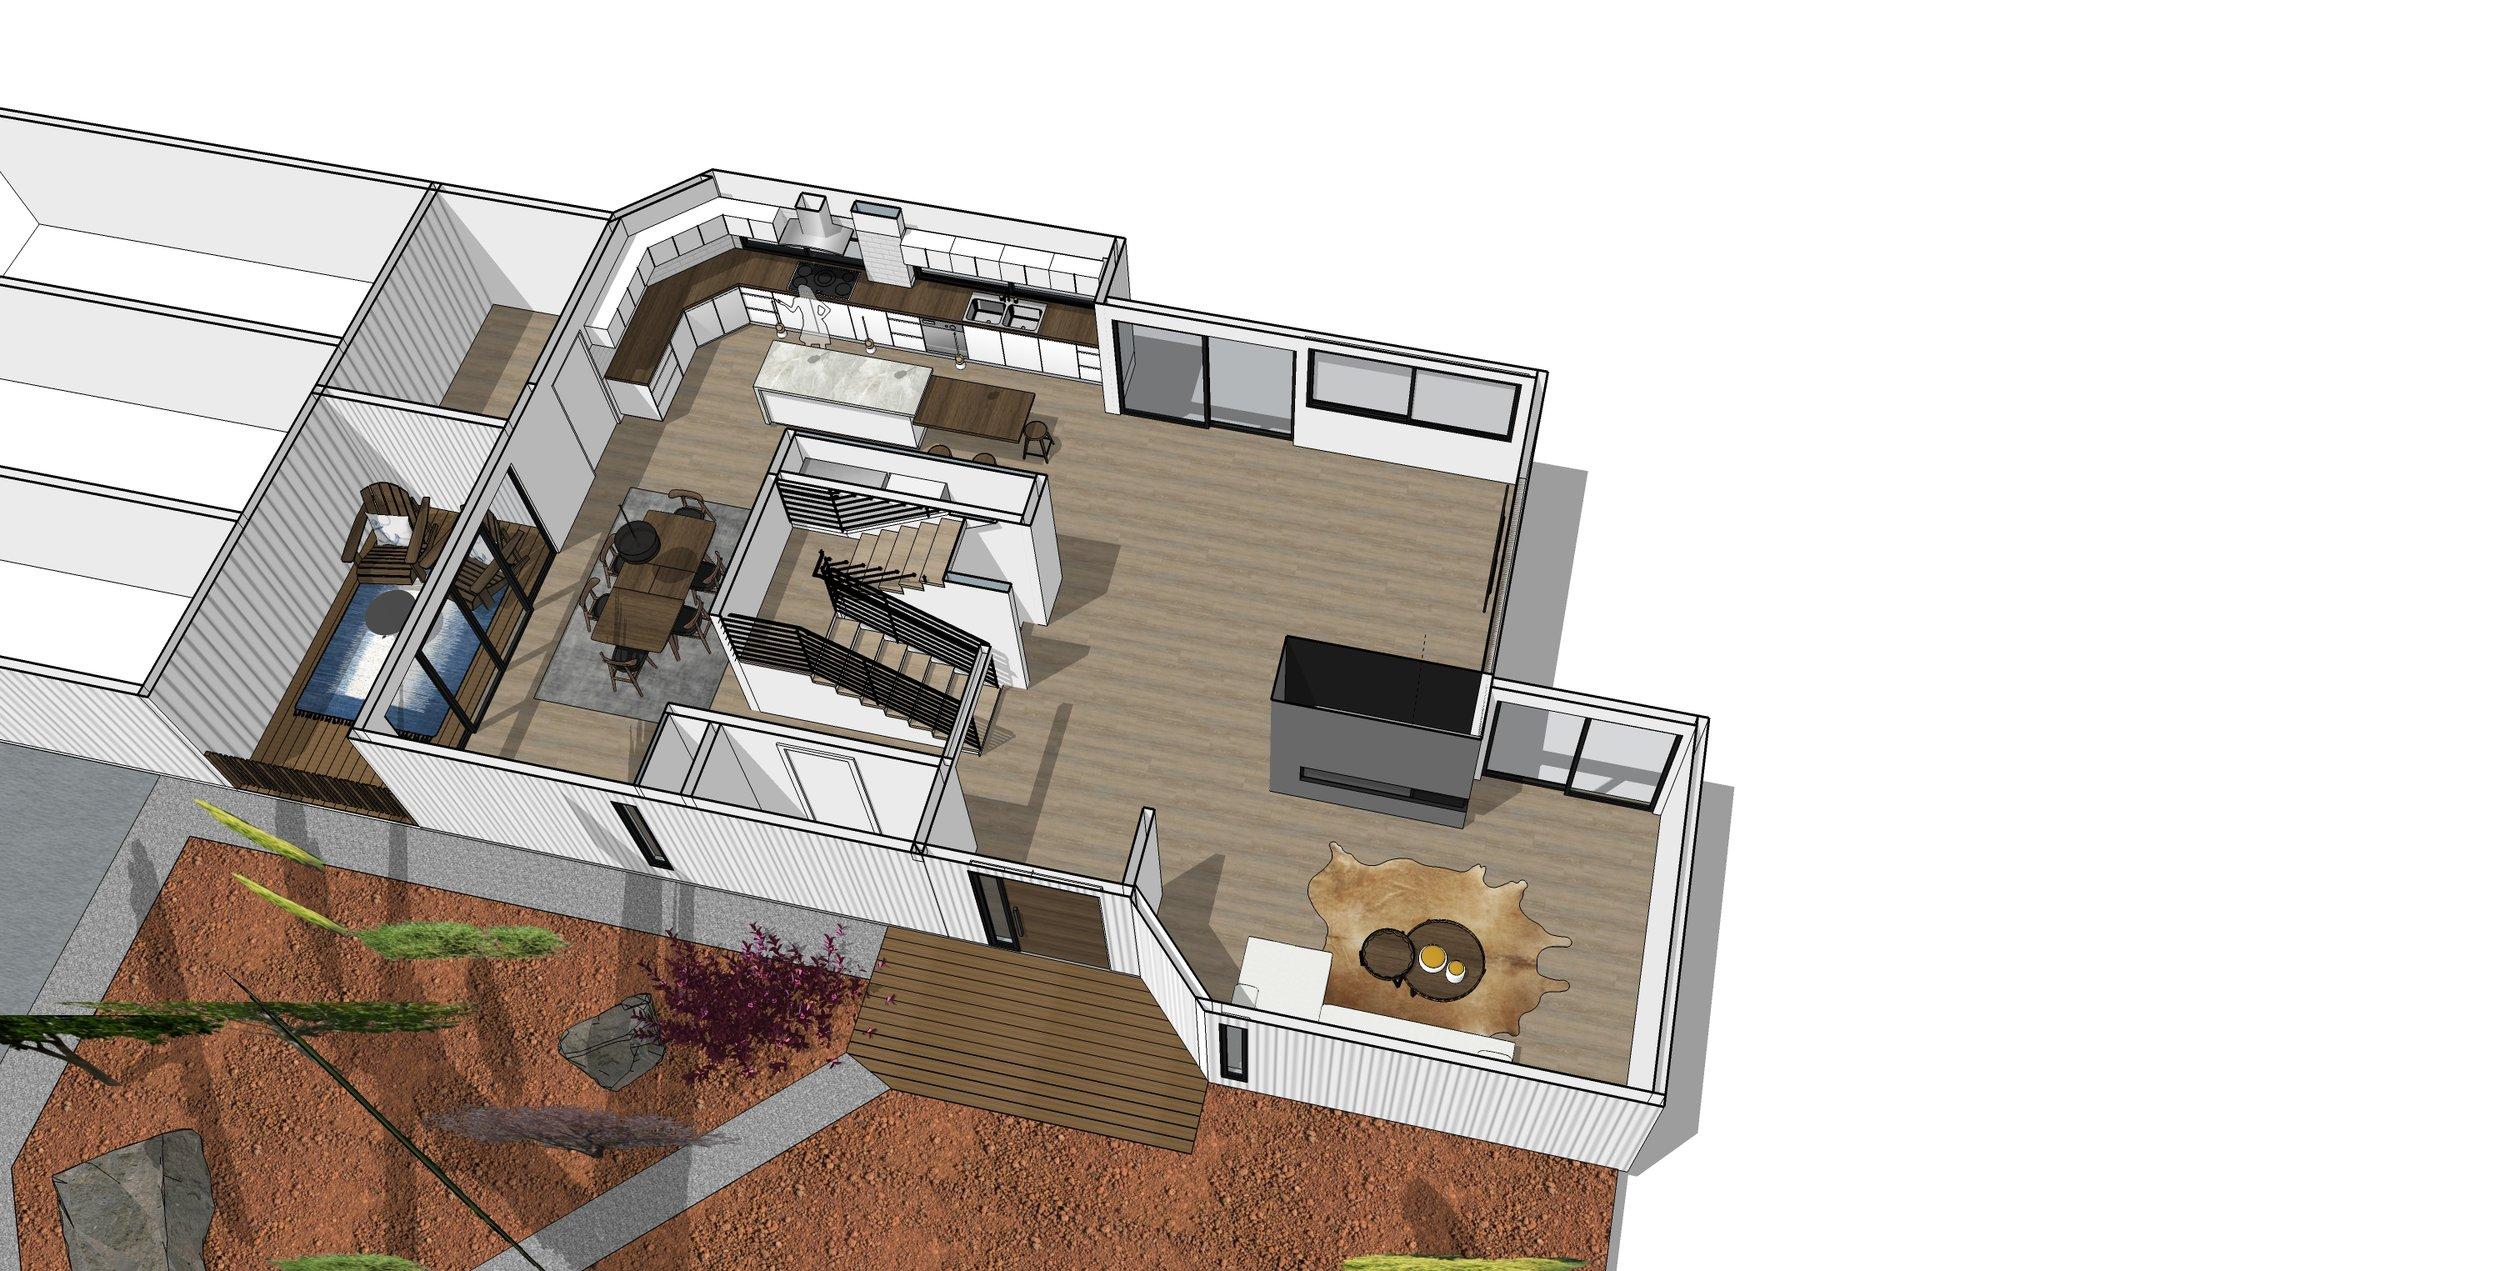 Axon View Of Bellevue House Remodel Plan